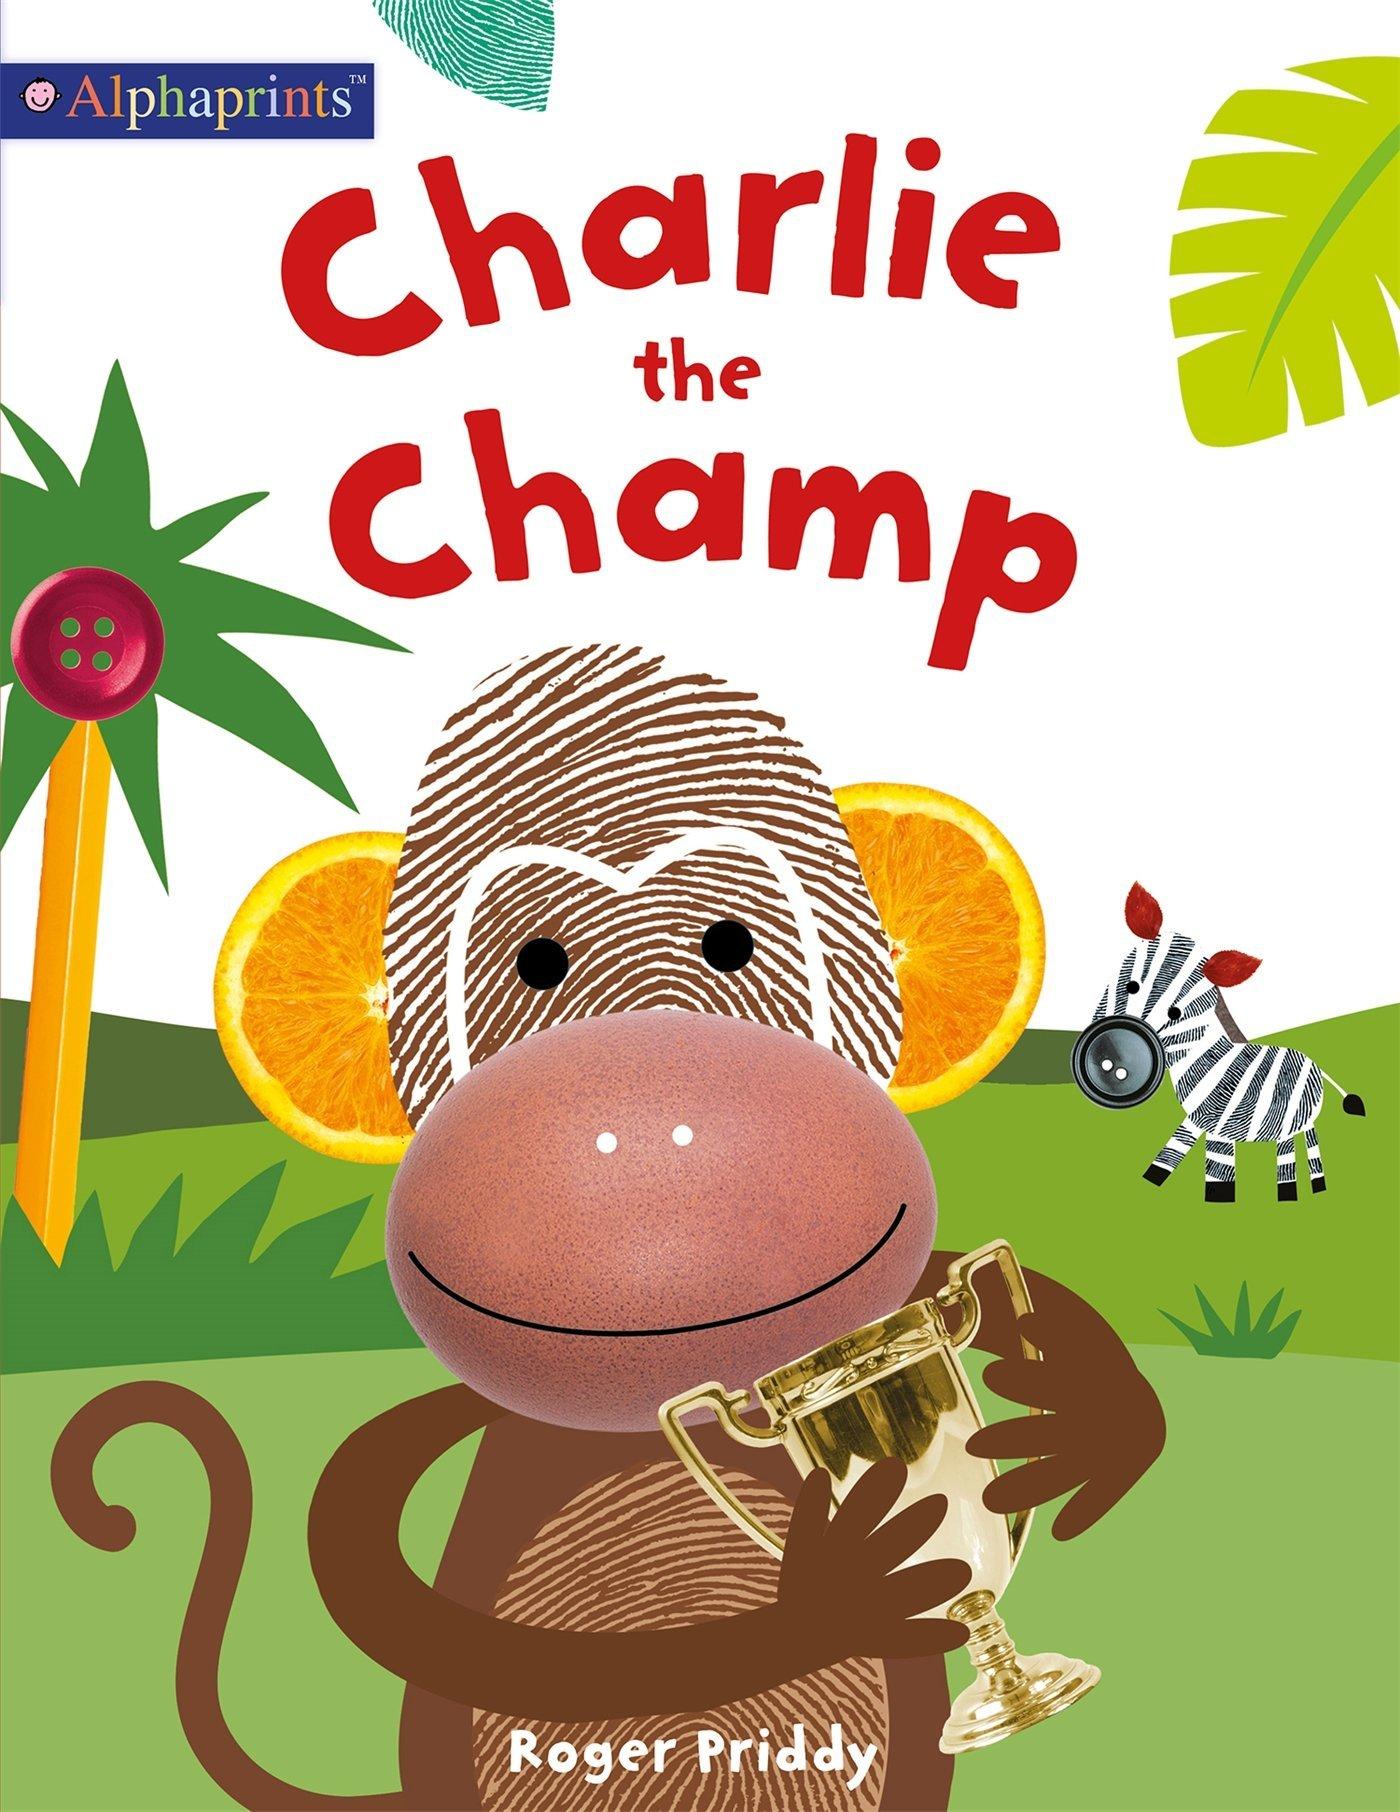 Charlie Champ Alphaprints Picture Book